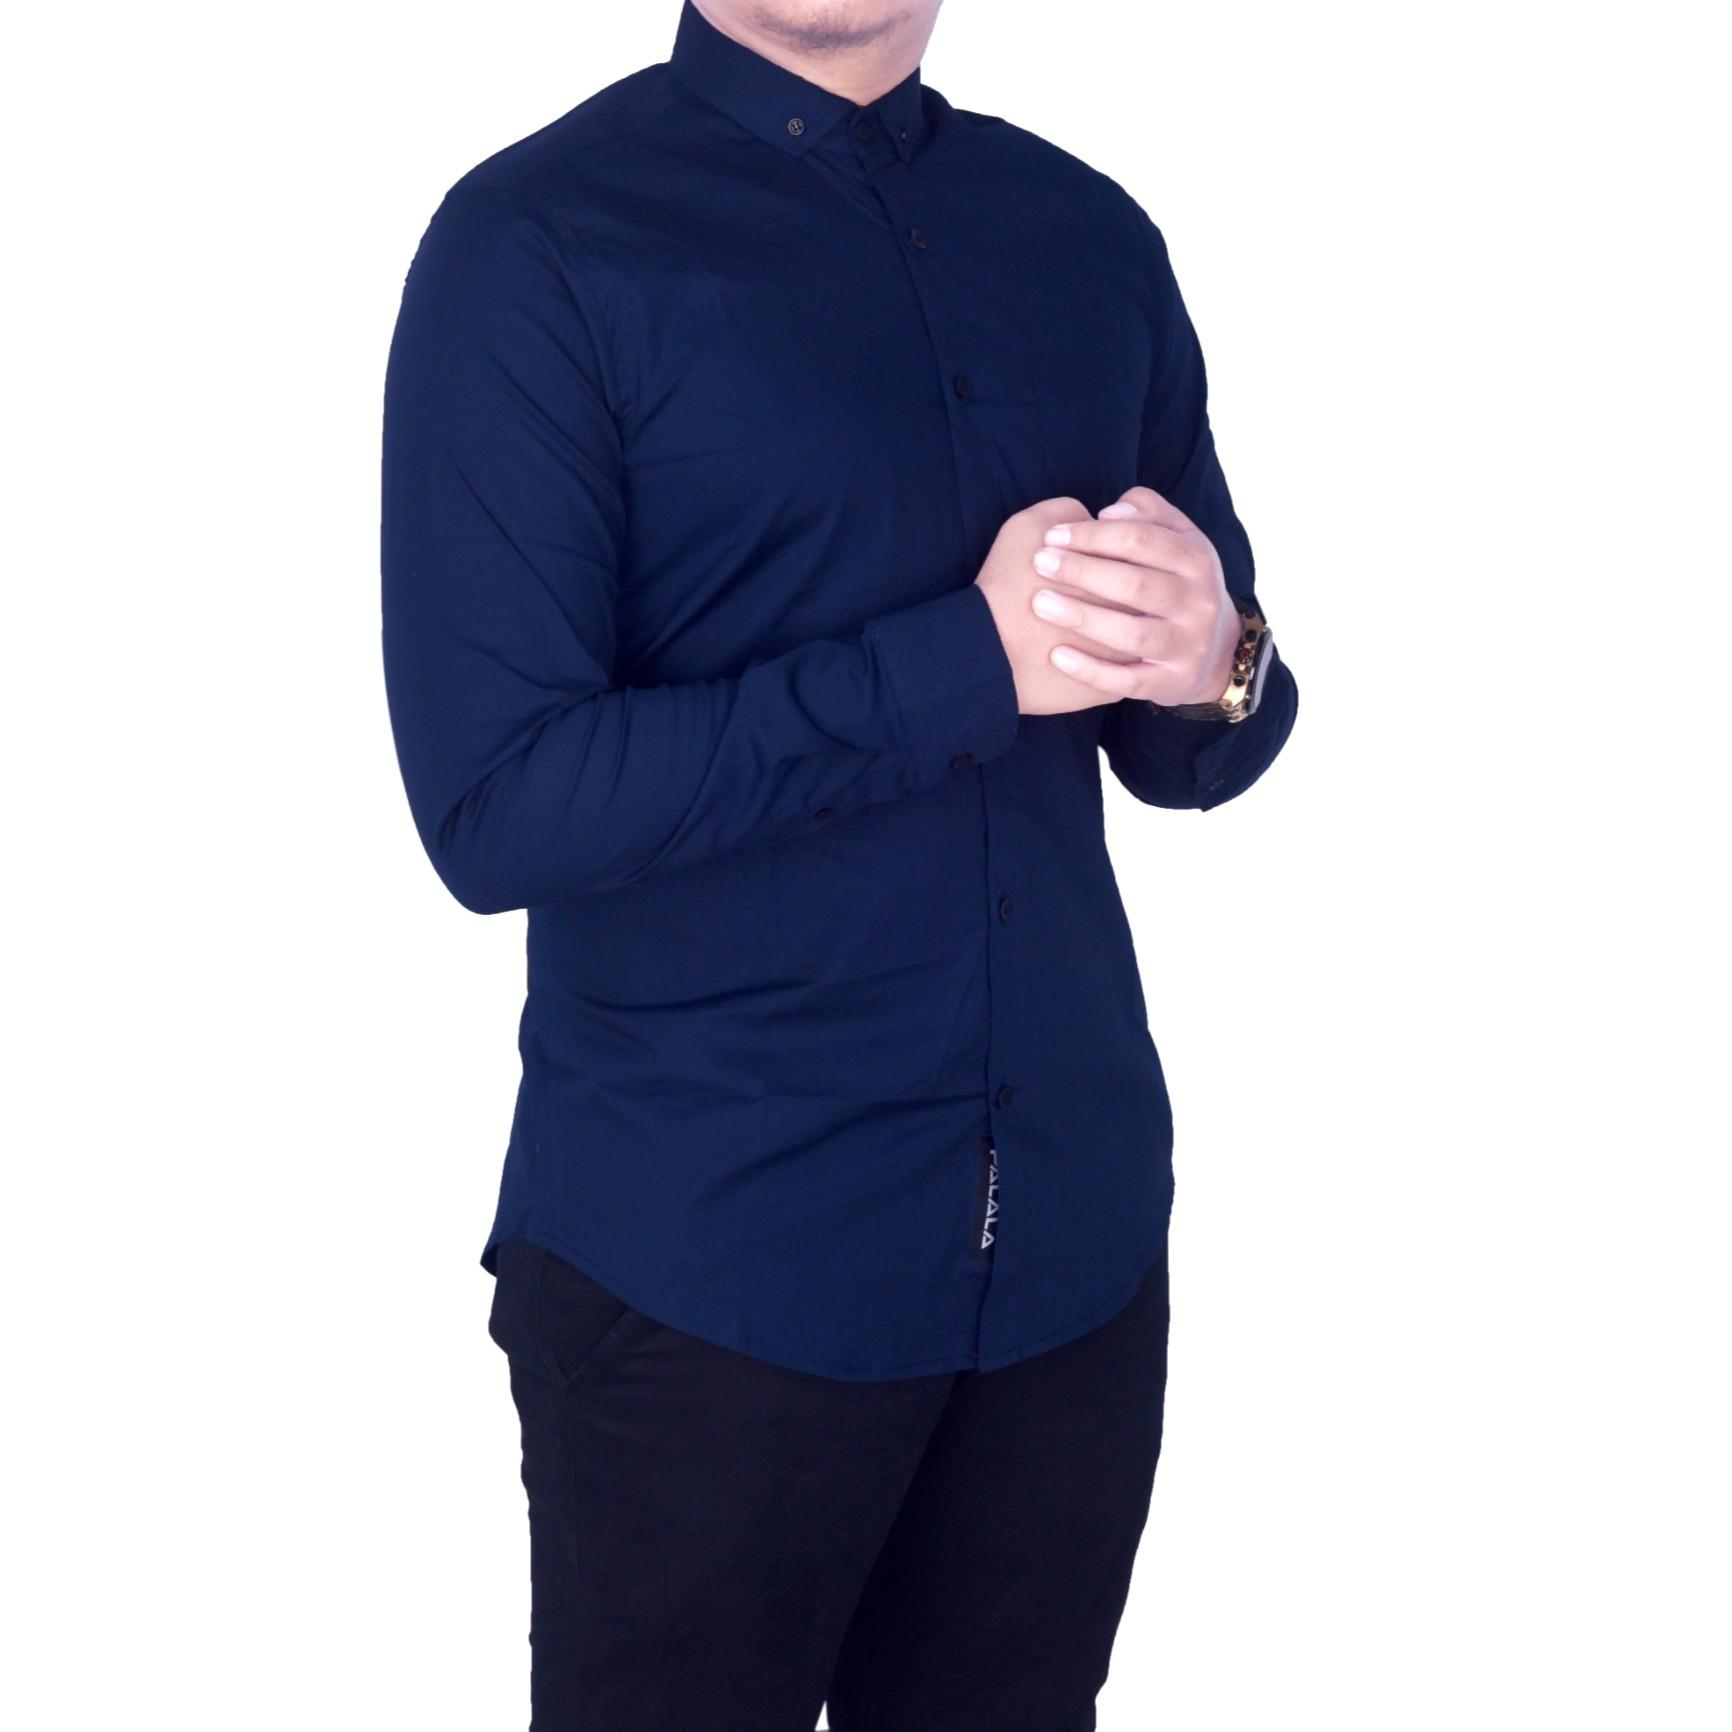 bsg_Fashion1 Kemeja Polos Lengan Panjang Pria Navy/Kemeja Woll/Kemeja Distro/Kemeja Formal/Kemeja Sholat/Kemeja Murah/Kemeja Hem/Kemeja Kemeja Swage/Kemeja Formal/Kemeja Young Lex/Kemeja Kerja/Kemeja Batik PX 4607